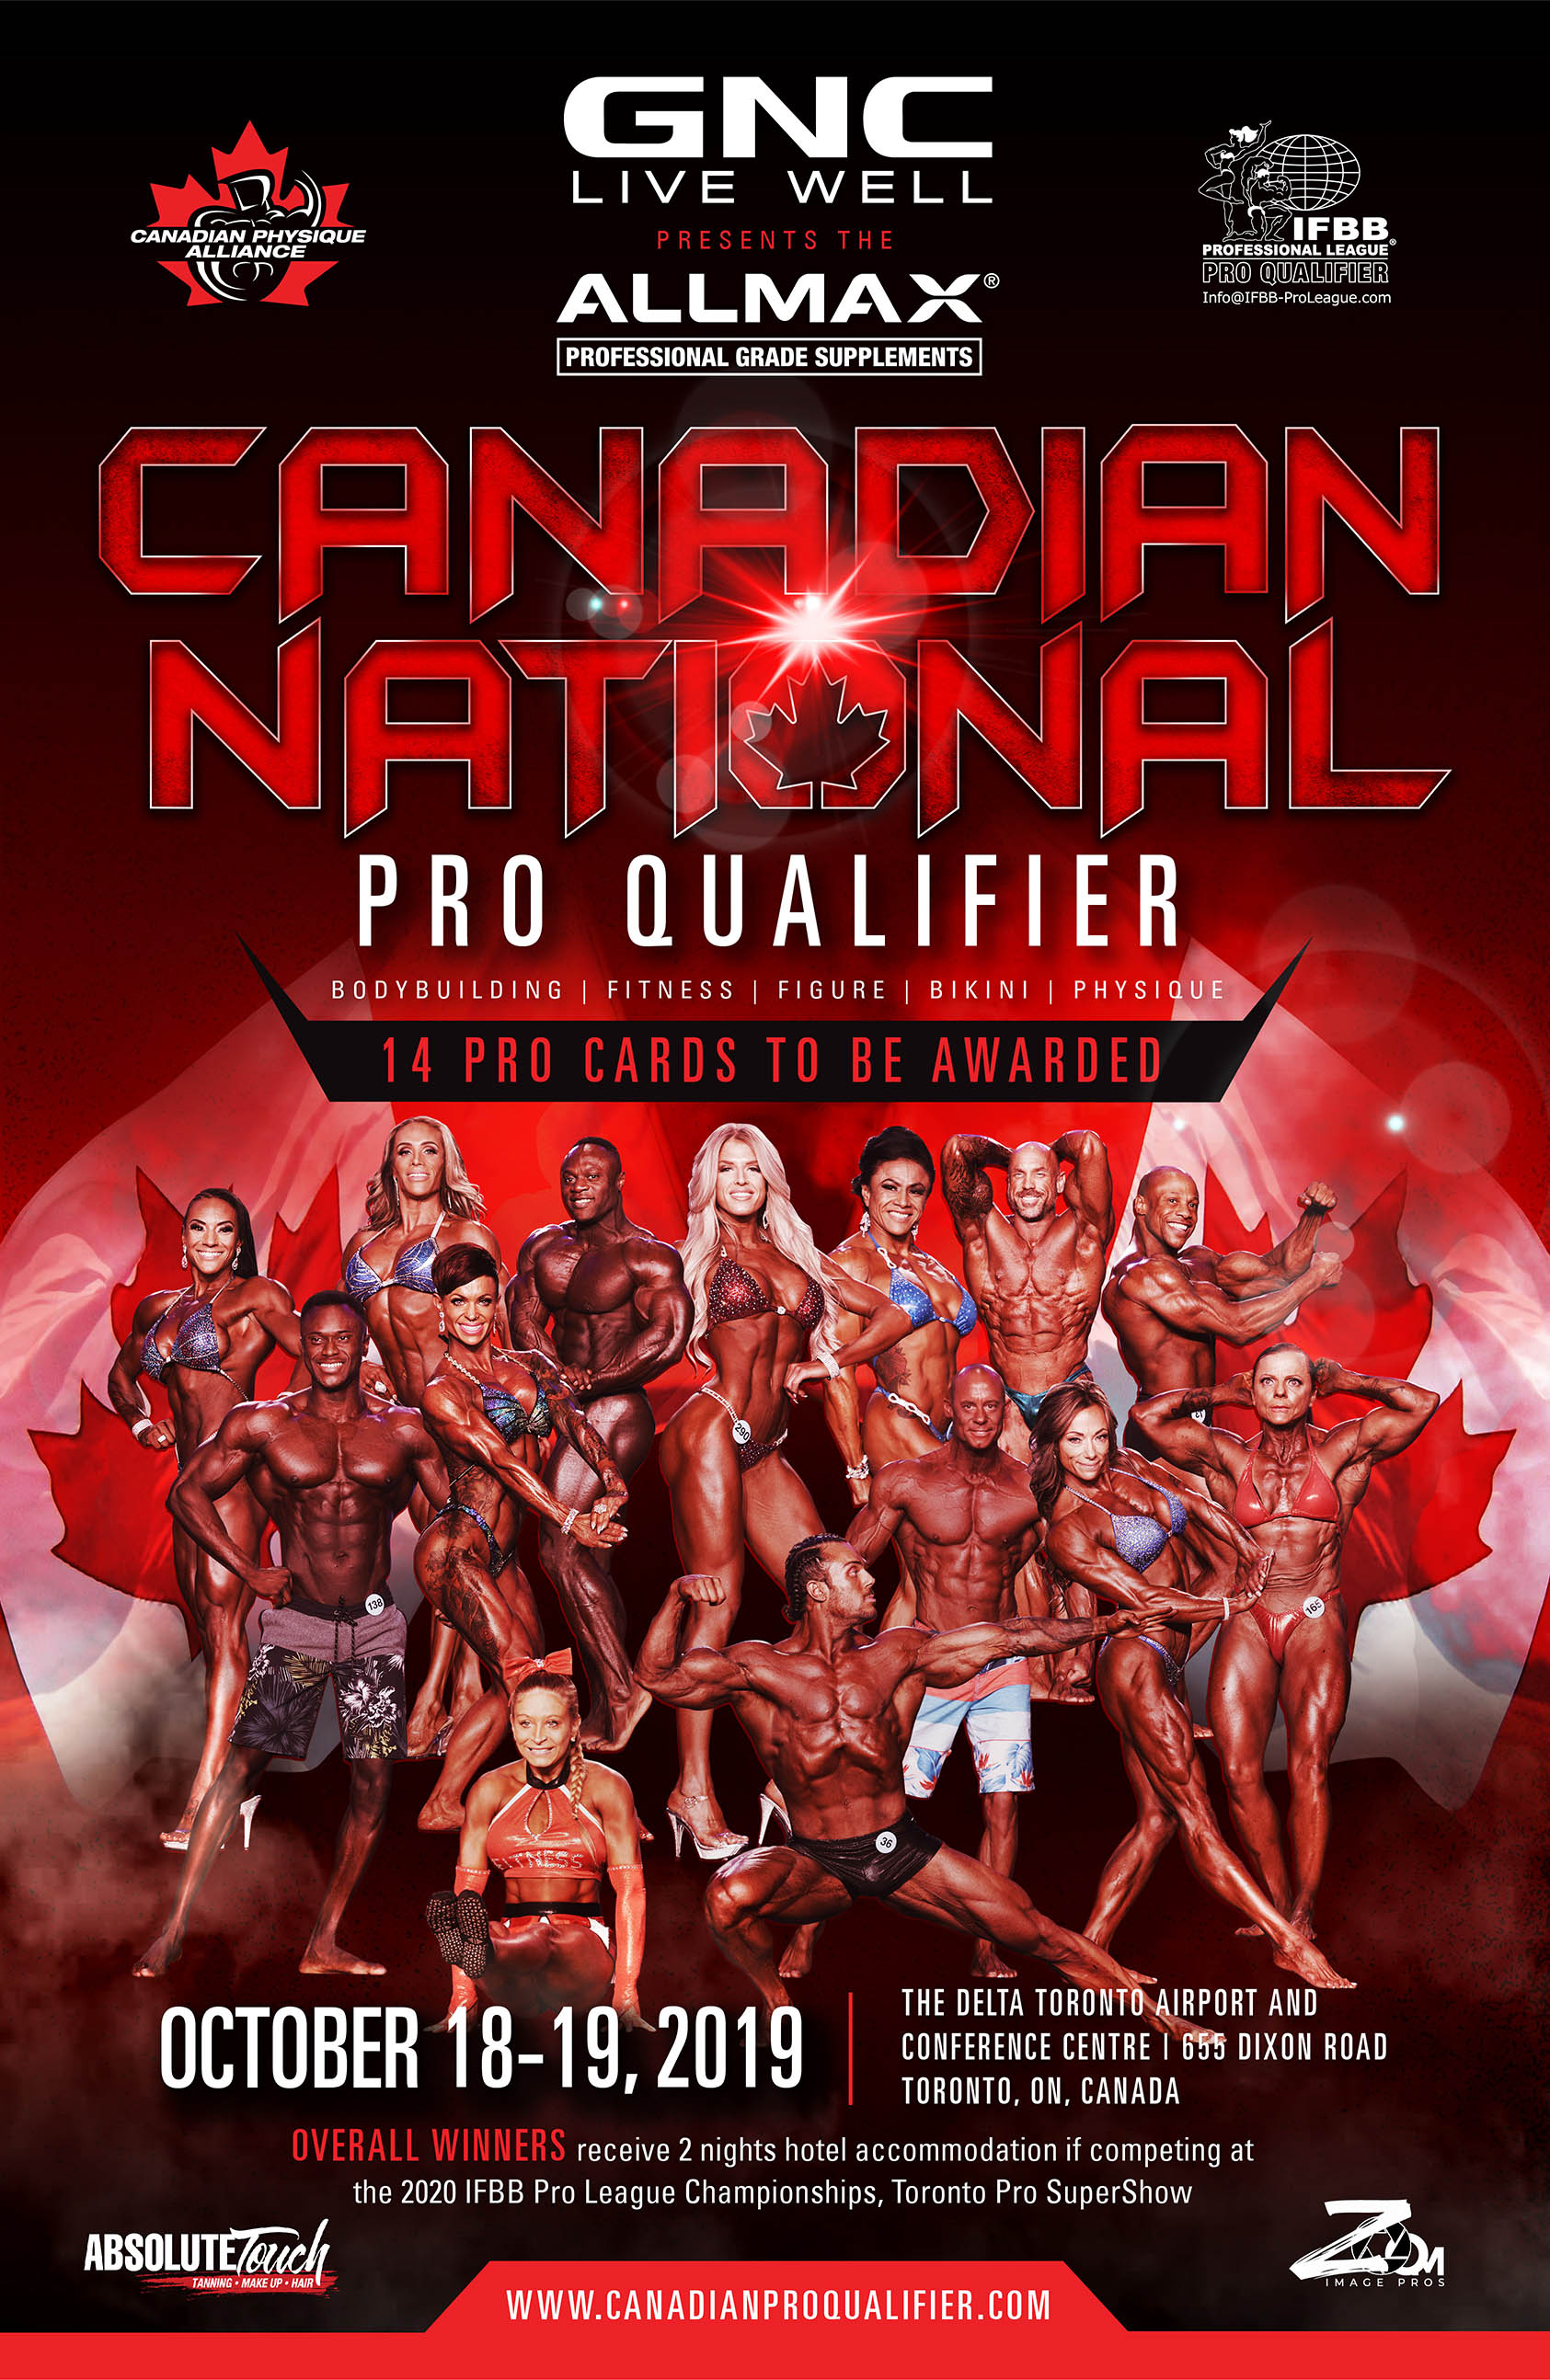 2019 GNC/Allmax Canadian National Pro Qualifier